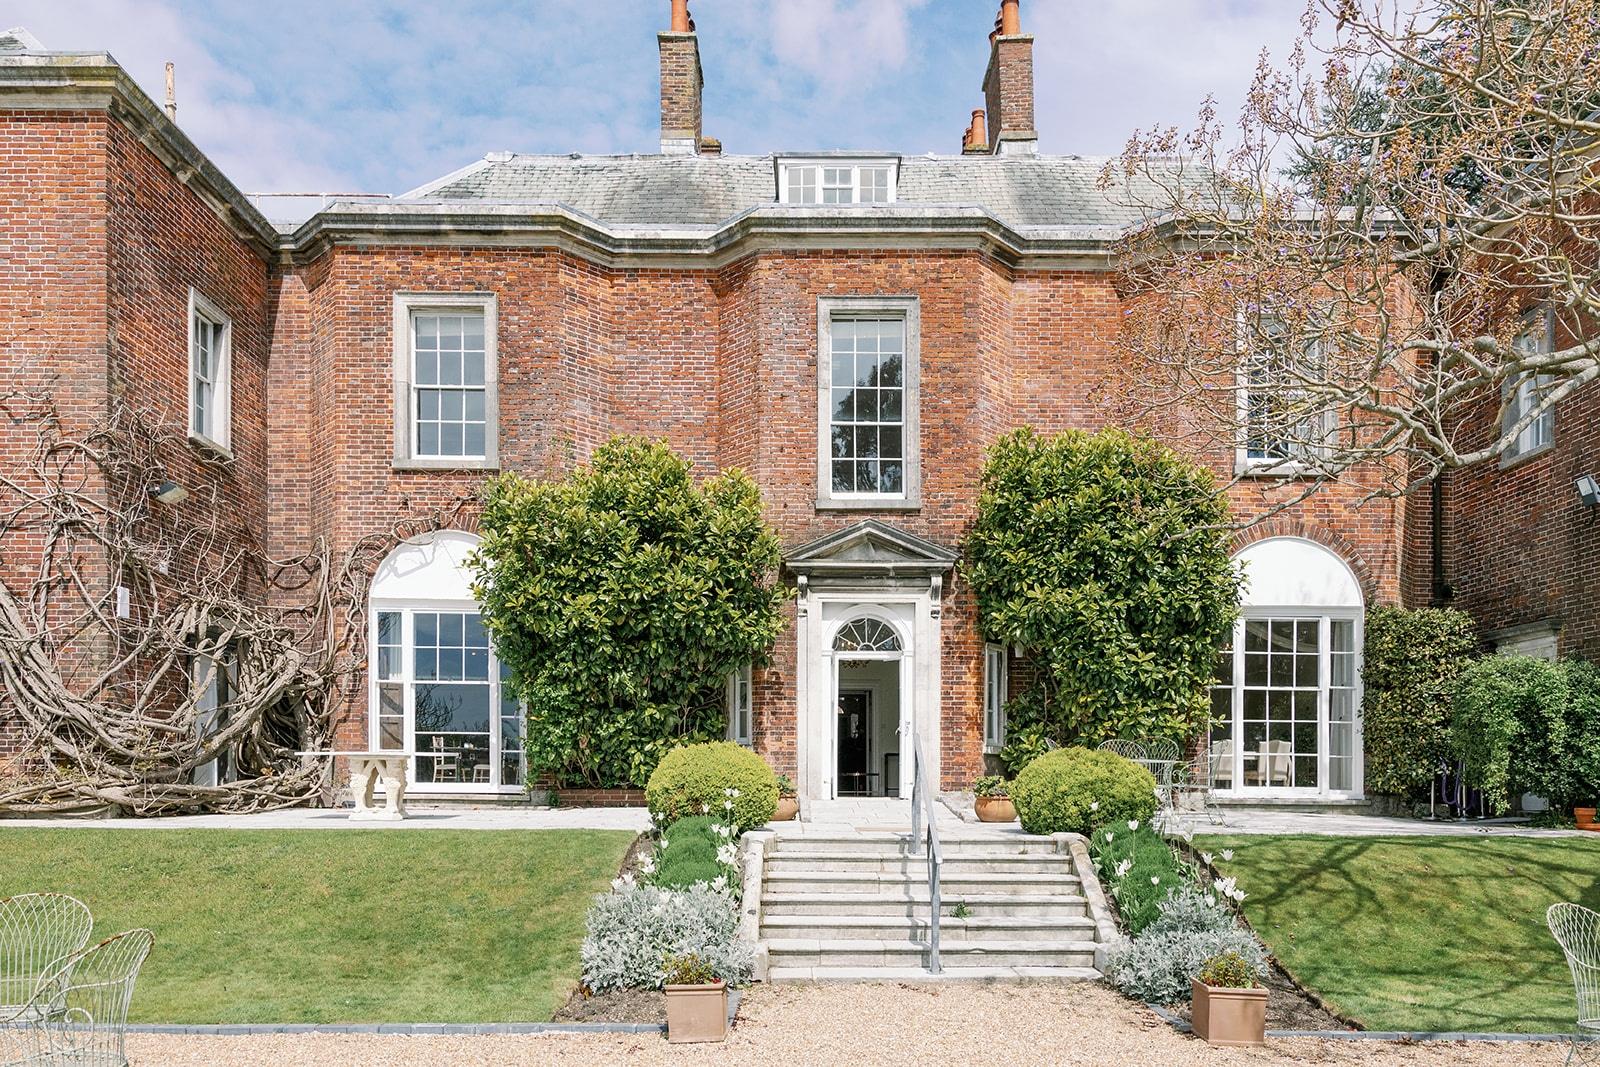 Pelham House wedding venue in Lewes